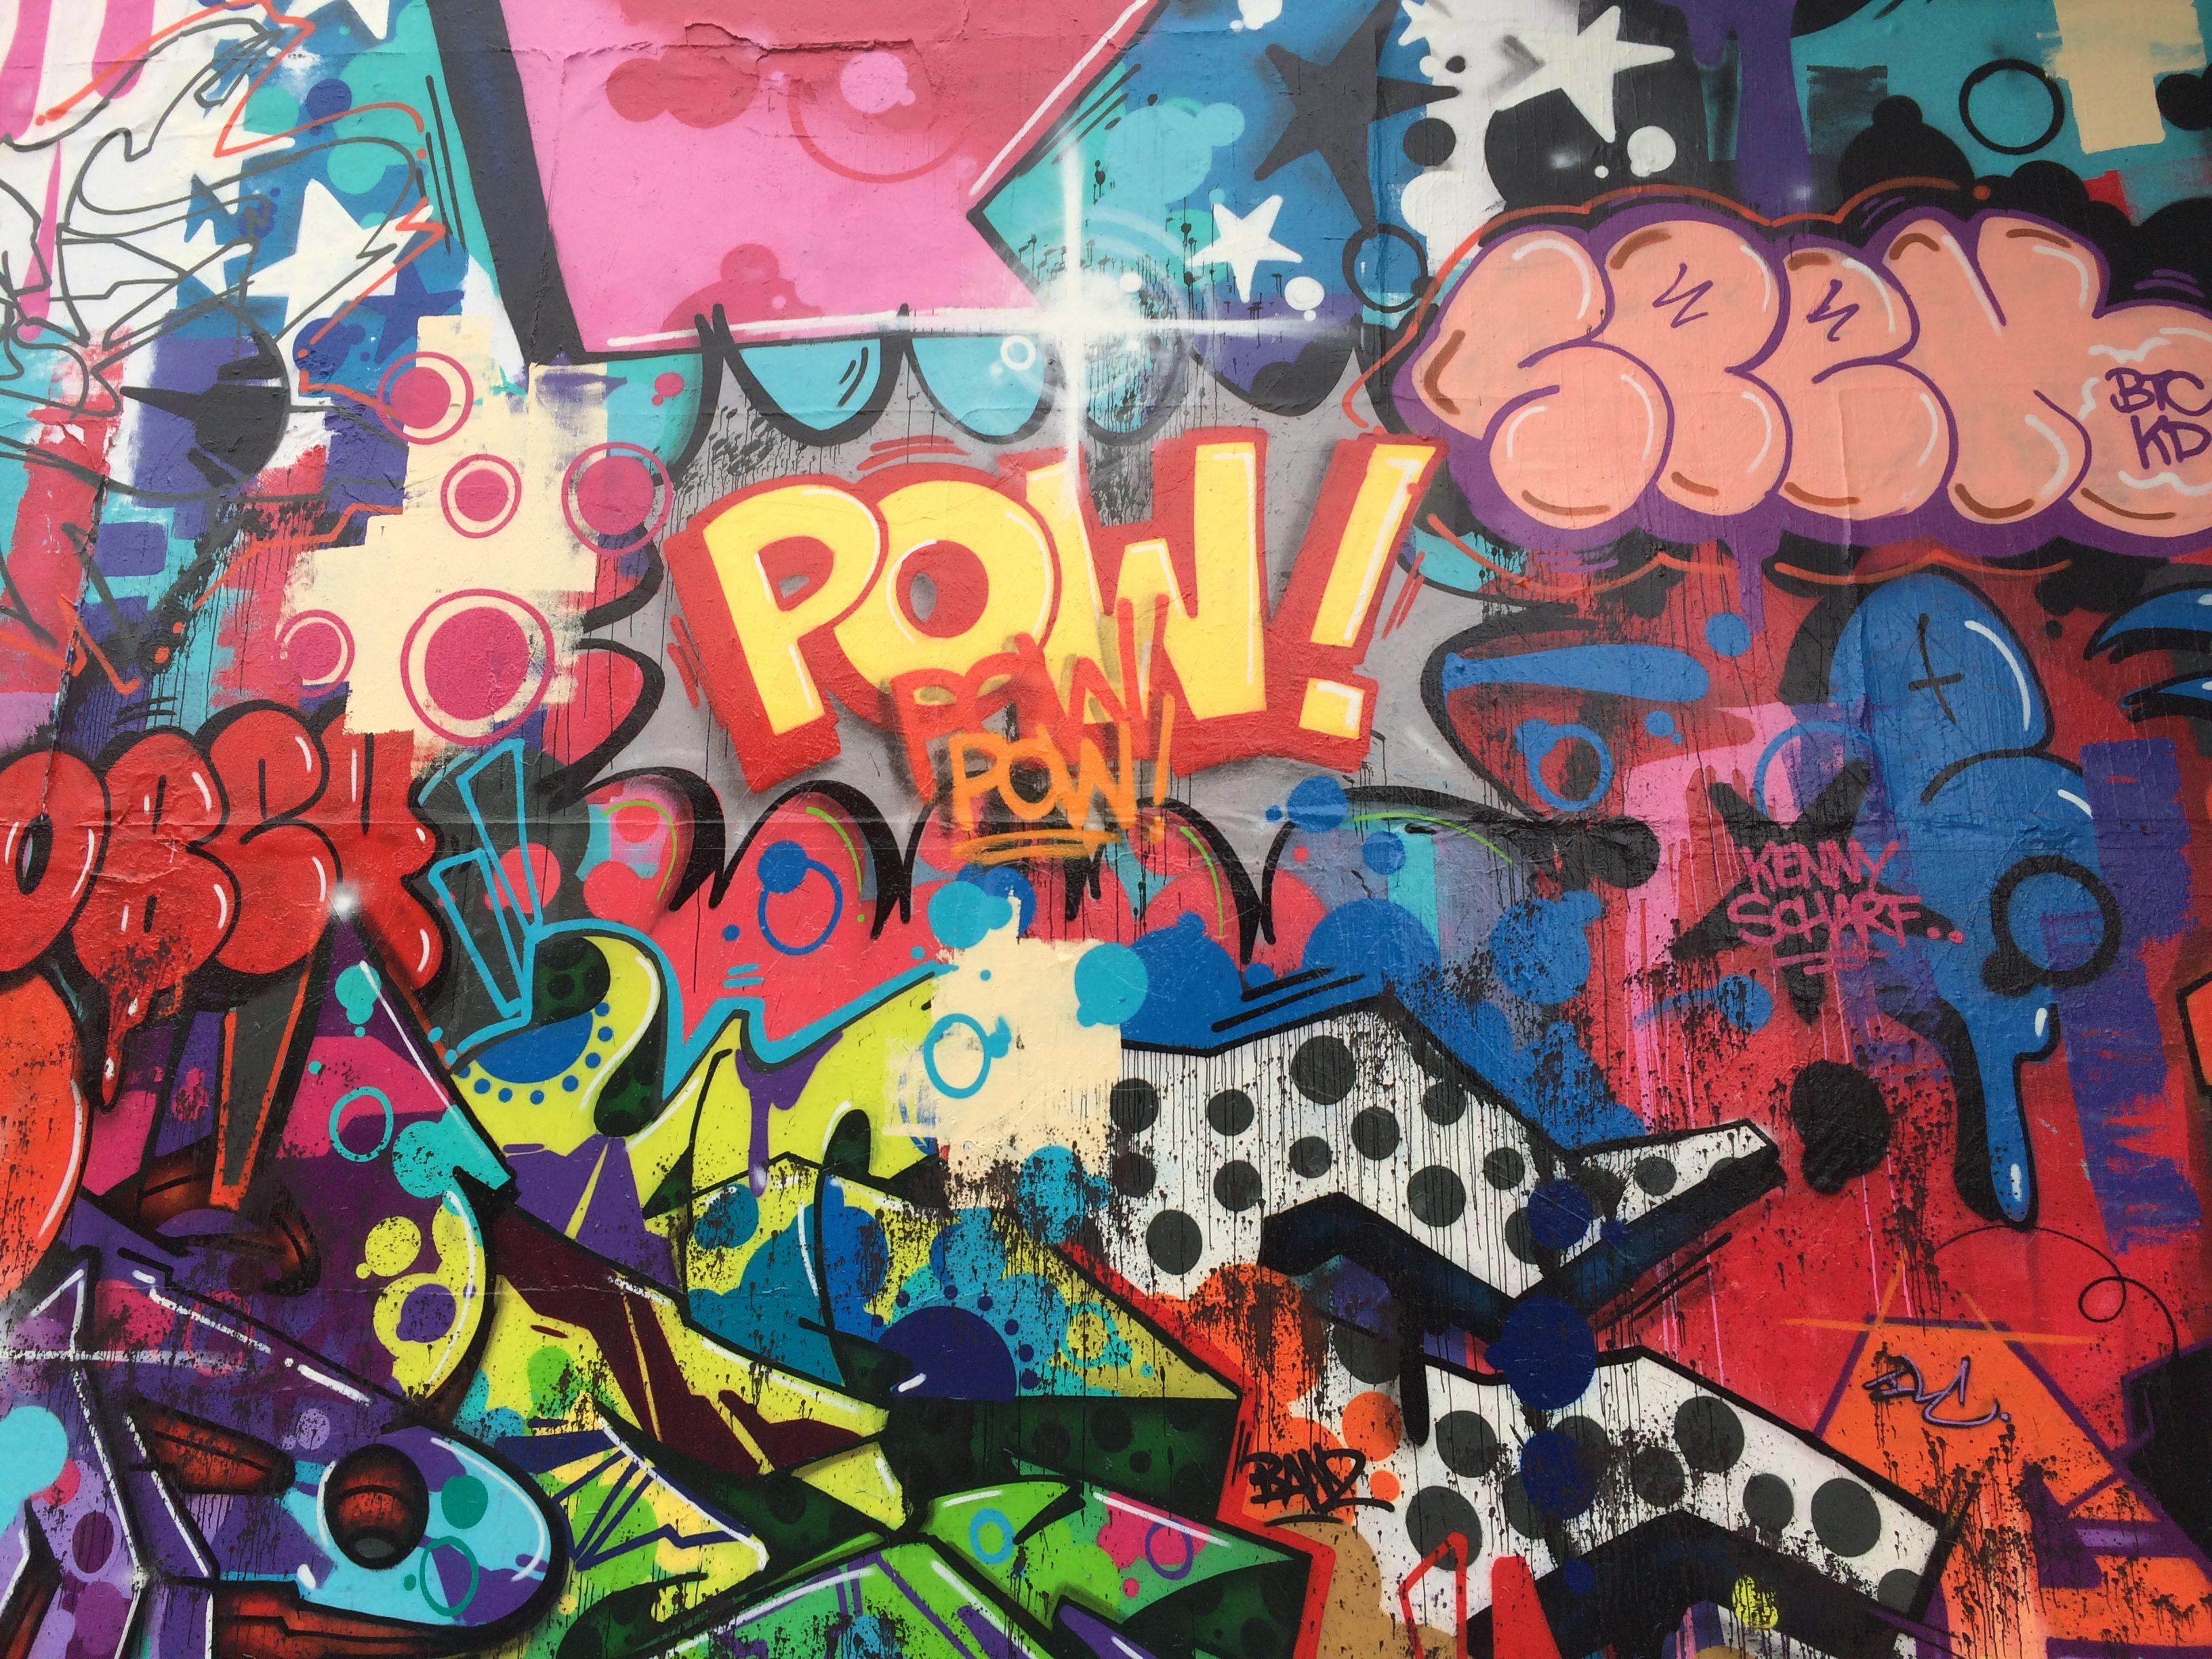 Graffiti wall pictures - Graffiti Wall Dublin City Of Austin Graffiti Walls Google Search